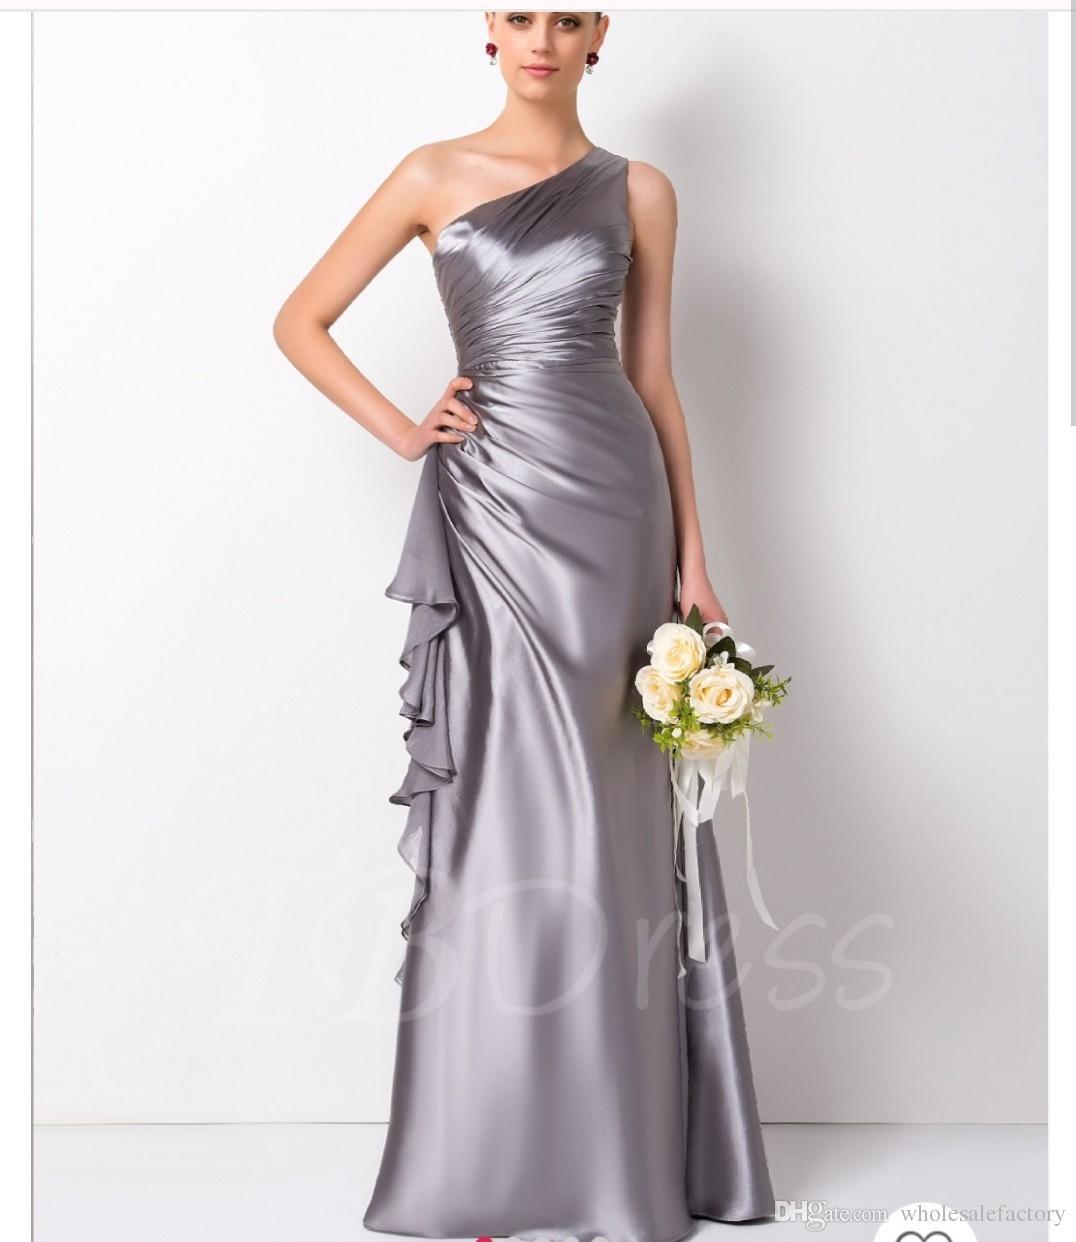 2018 Elegant One Shoulder Satin Mermaid Long bridesmaid Dresses Ruffles Floor Length Evening Dress Prom Gowns Wedding Party Dresses